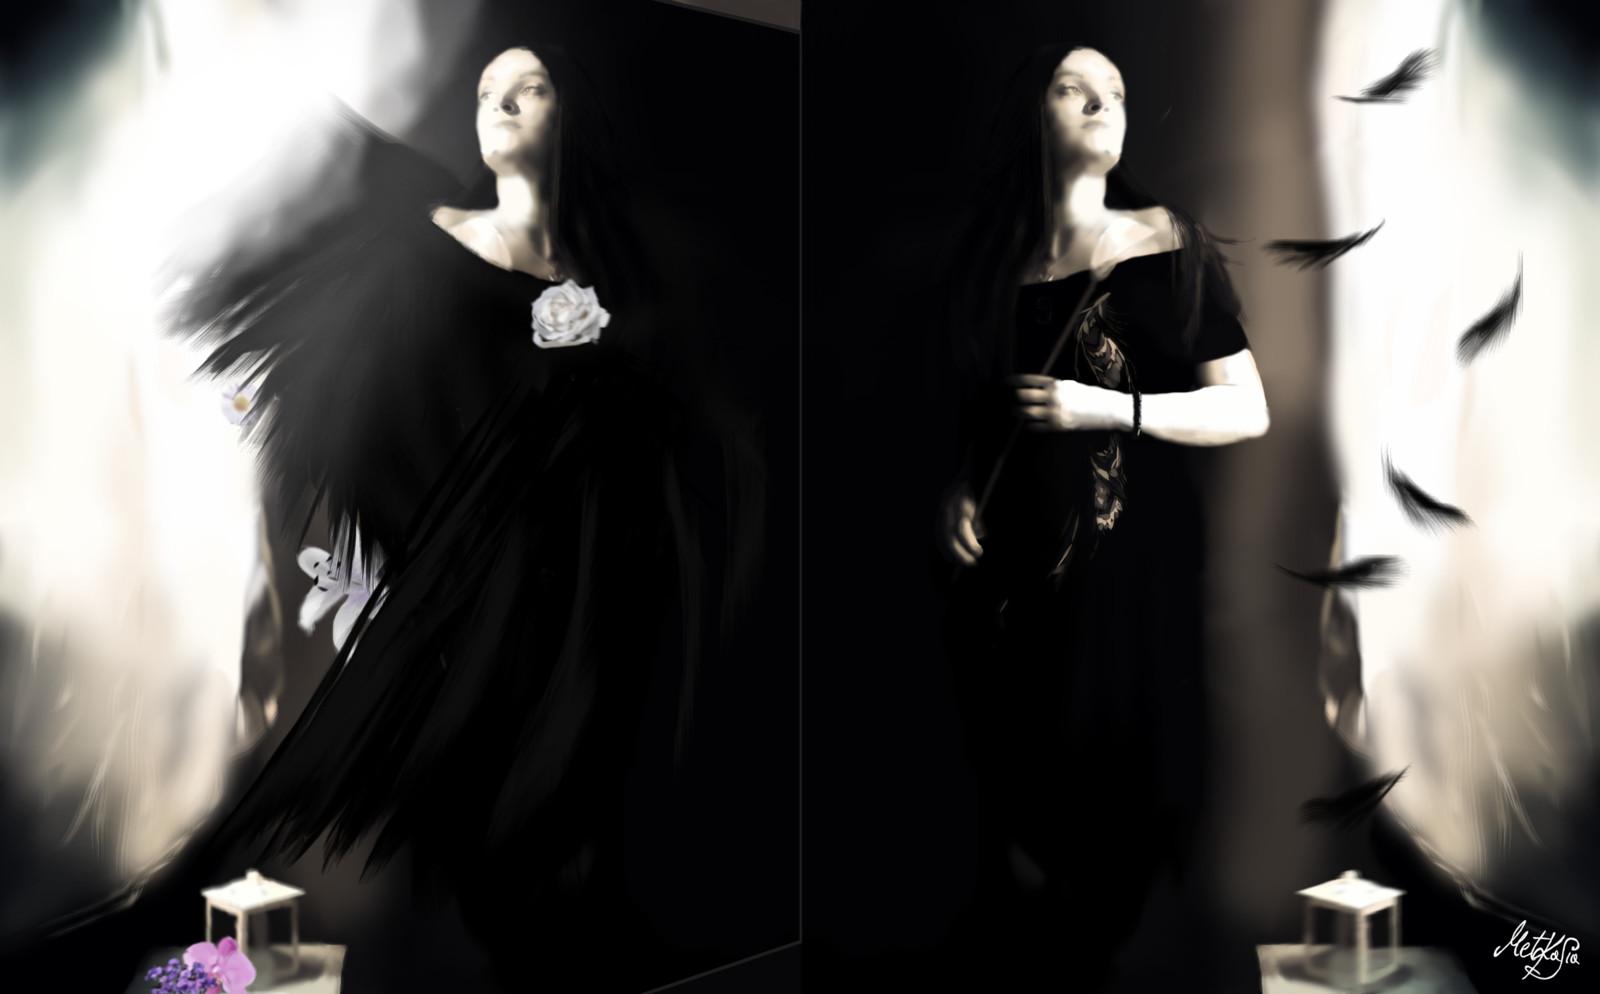 Lustro (Mirror)